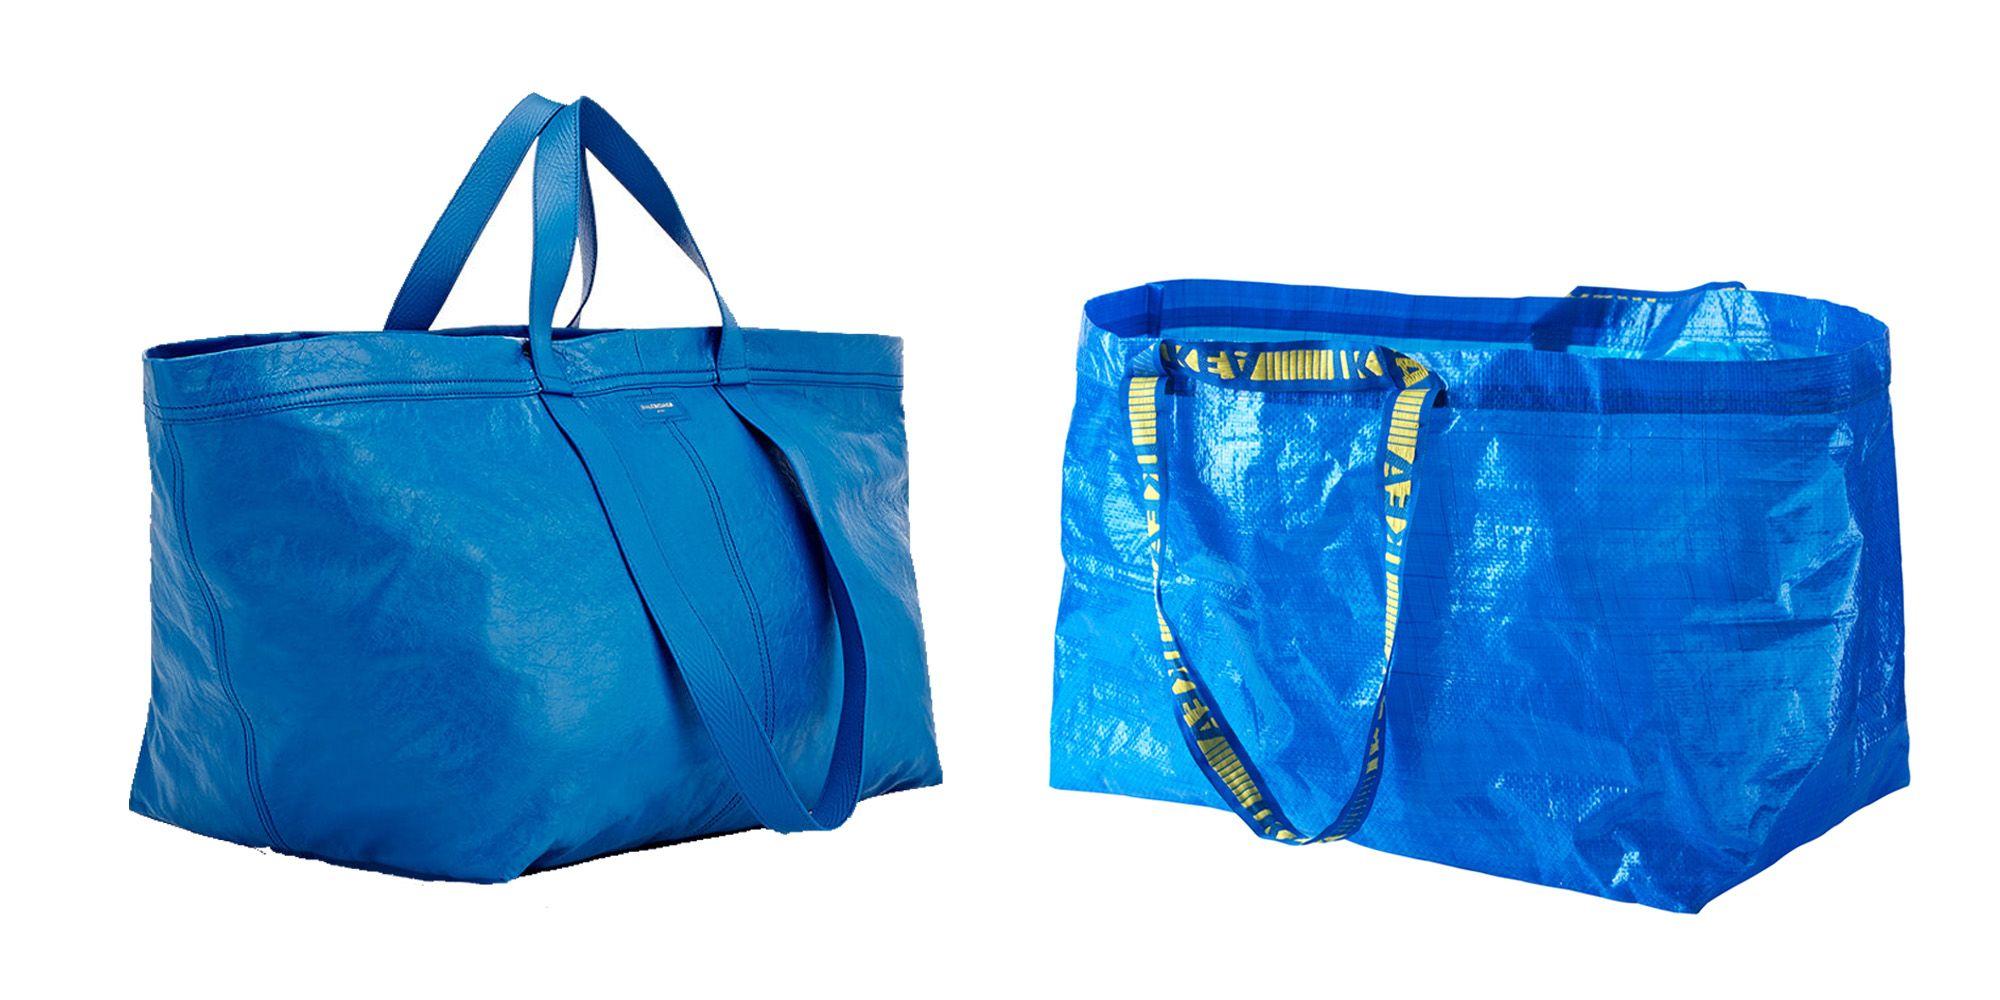 bccb79d8325 Balenciaga Bag Chanels IKEA's Iconic Tote - IKEA Bags